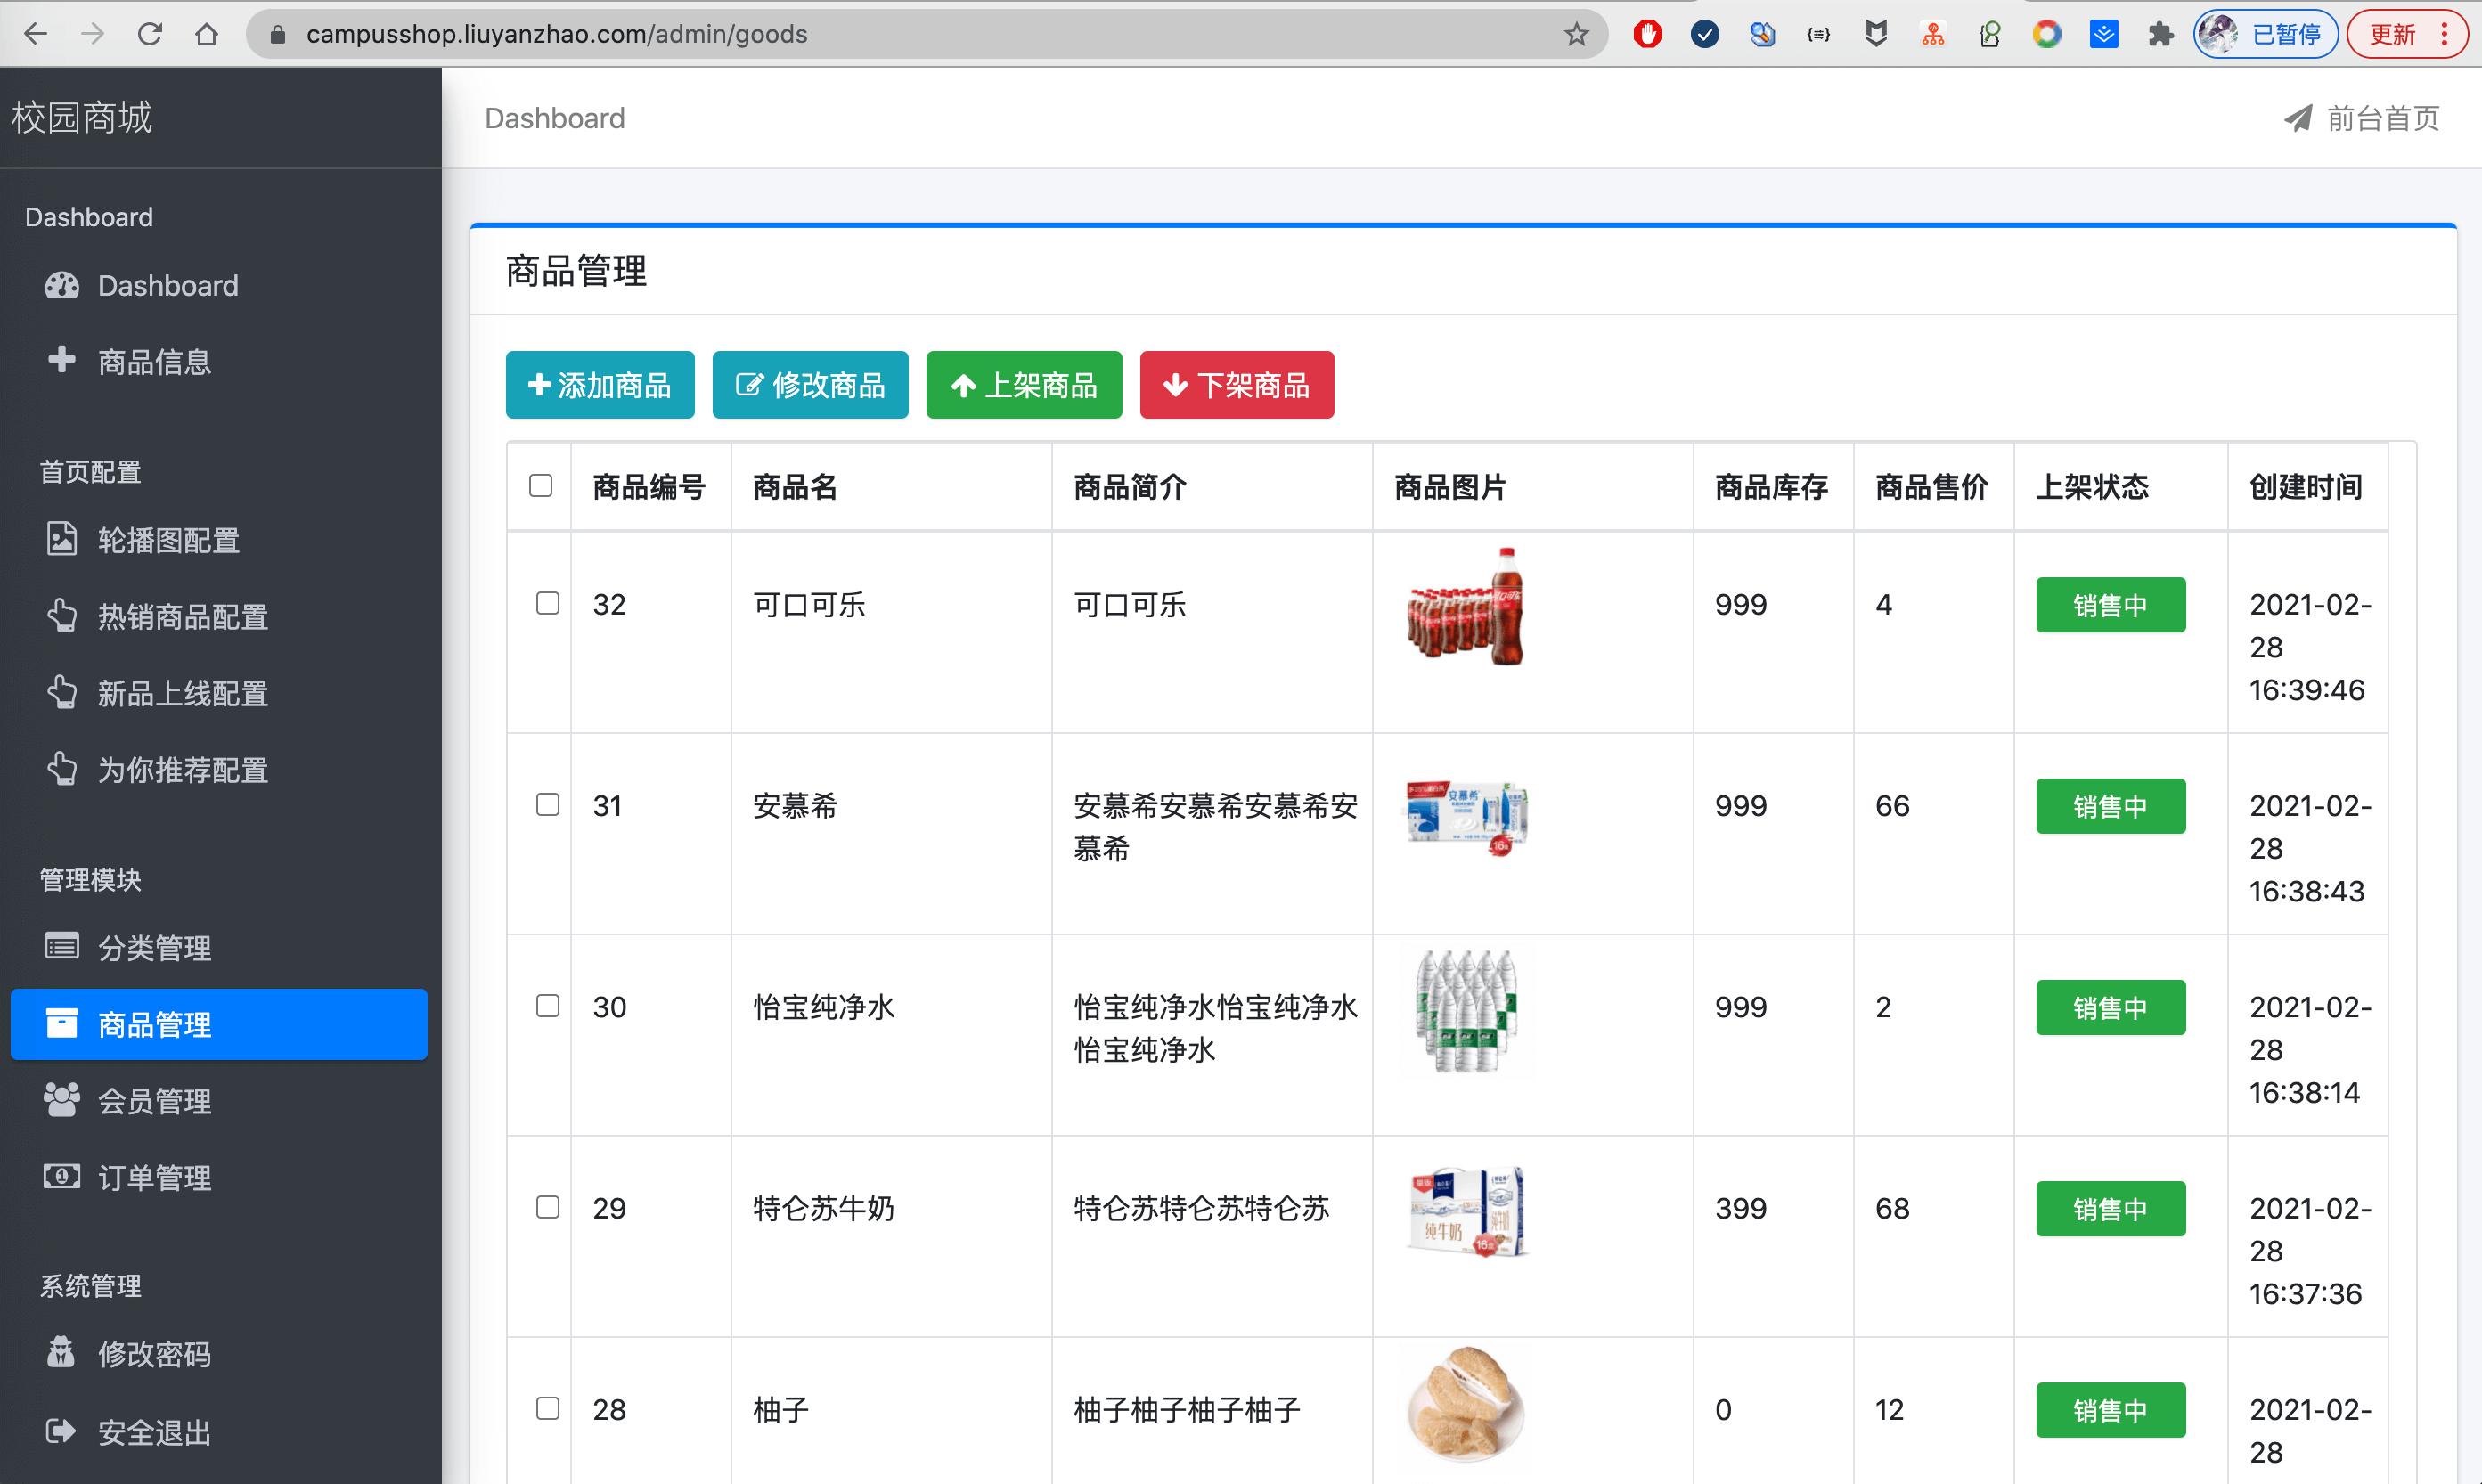 15-商品管理.png